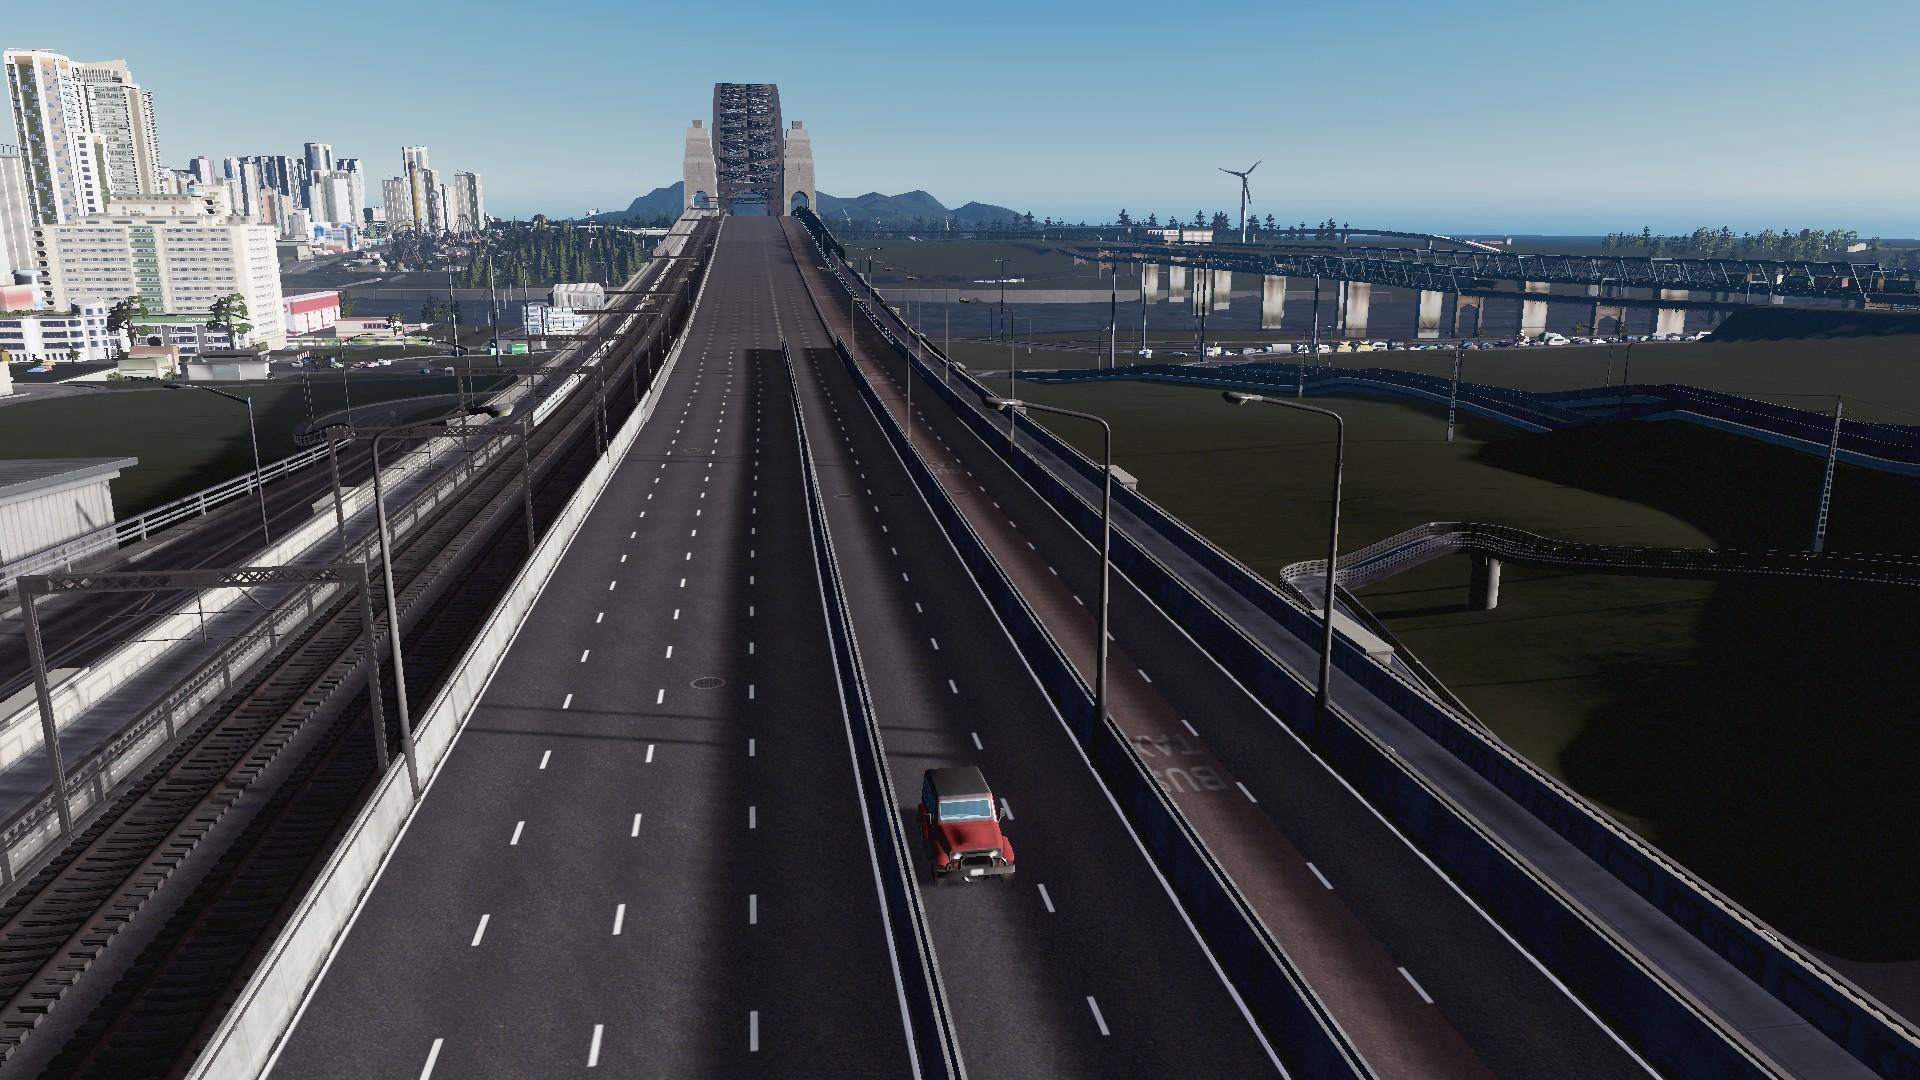 BadPeanut Gives #CitiesSkylines the Sydney Harbour Bridge. I Oblige and Build the Manukau River Bridge